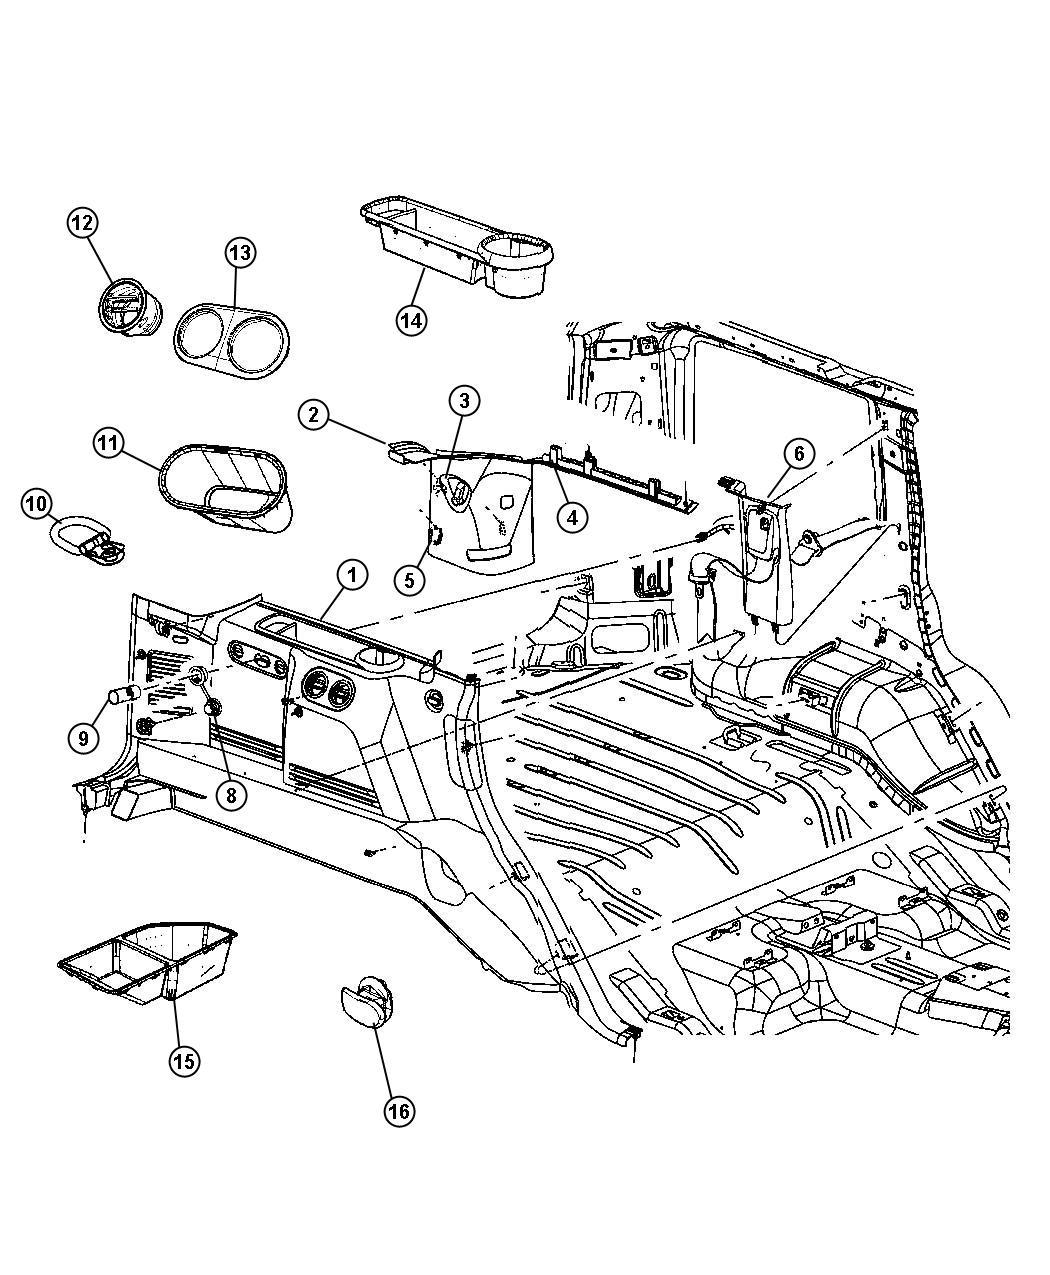 2007 Jeep Commander Plug. Release handle plug. Trim: (*o0